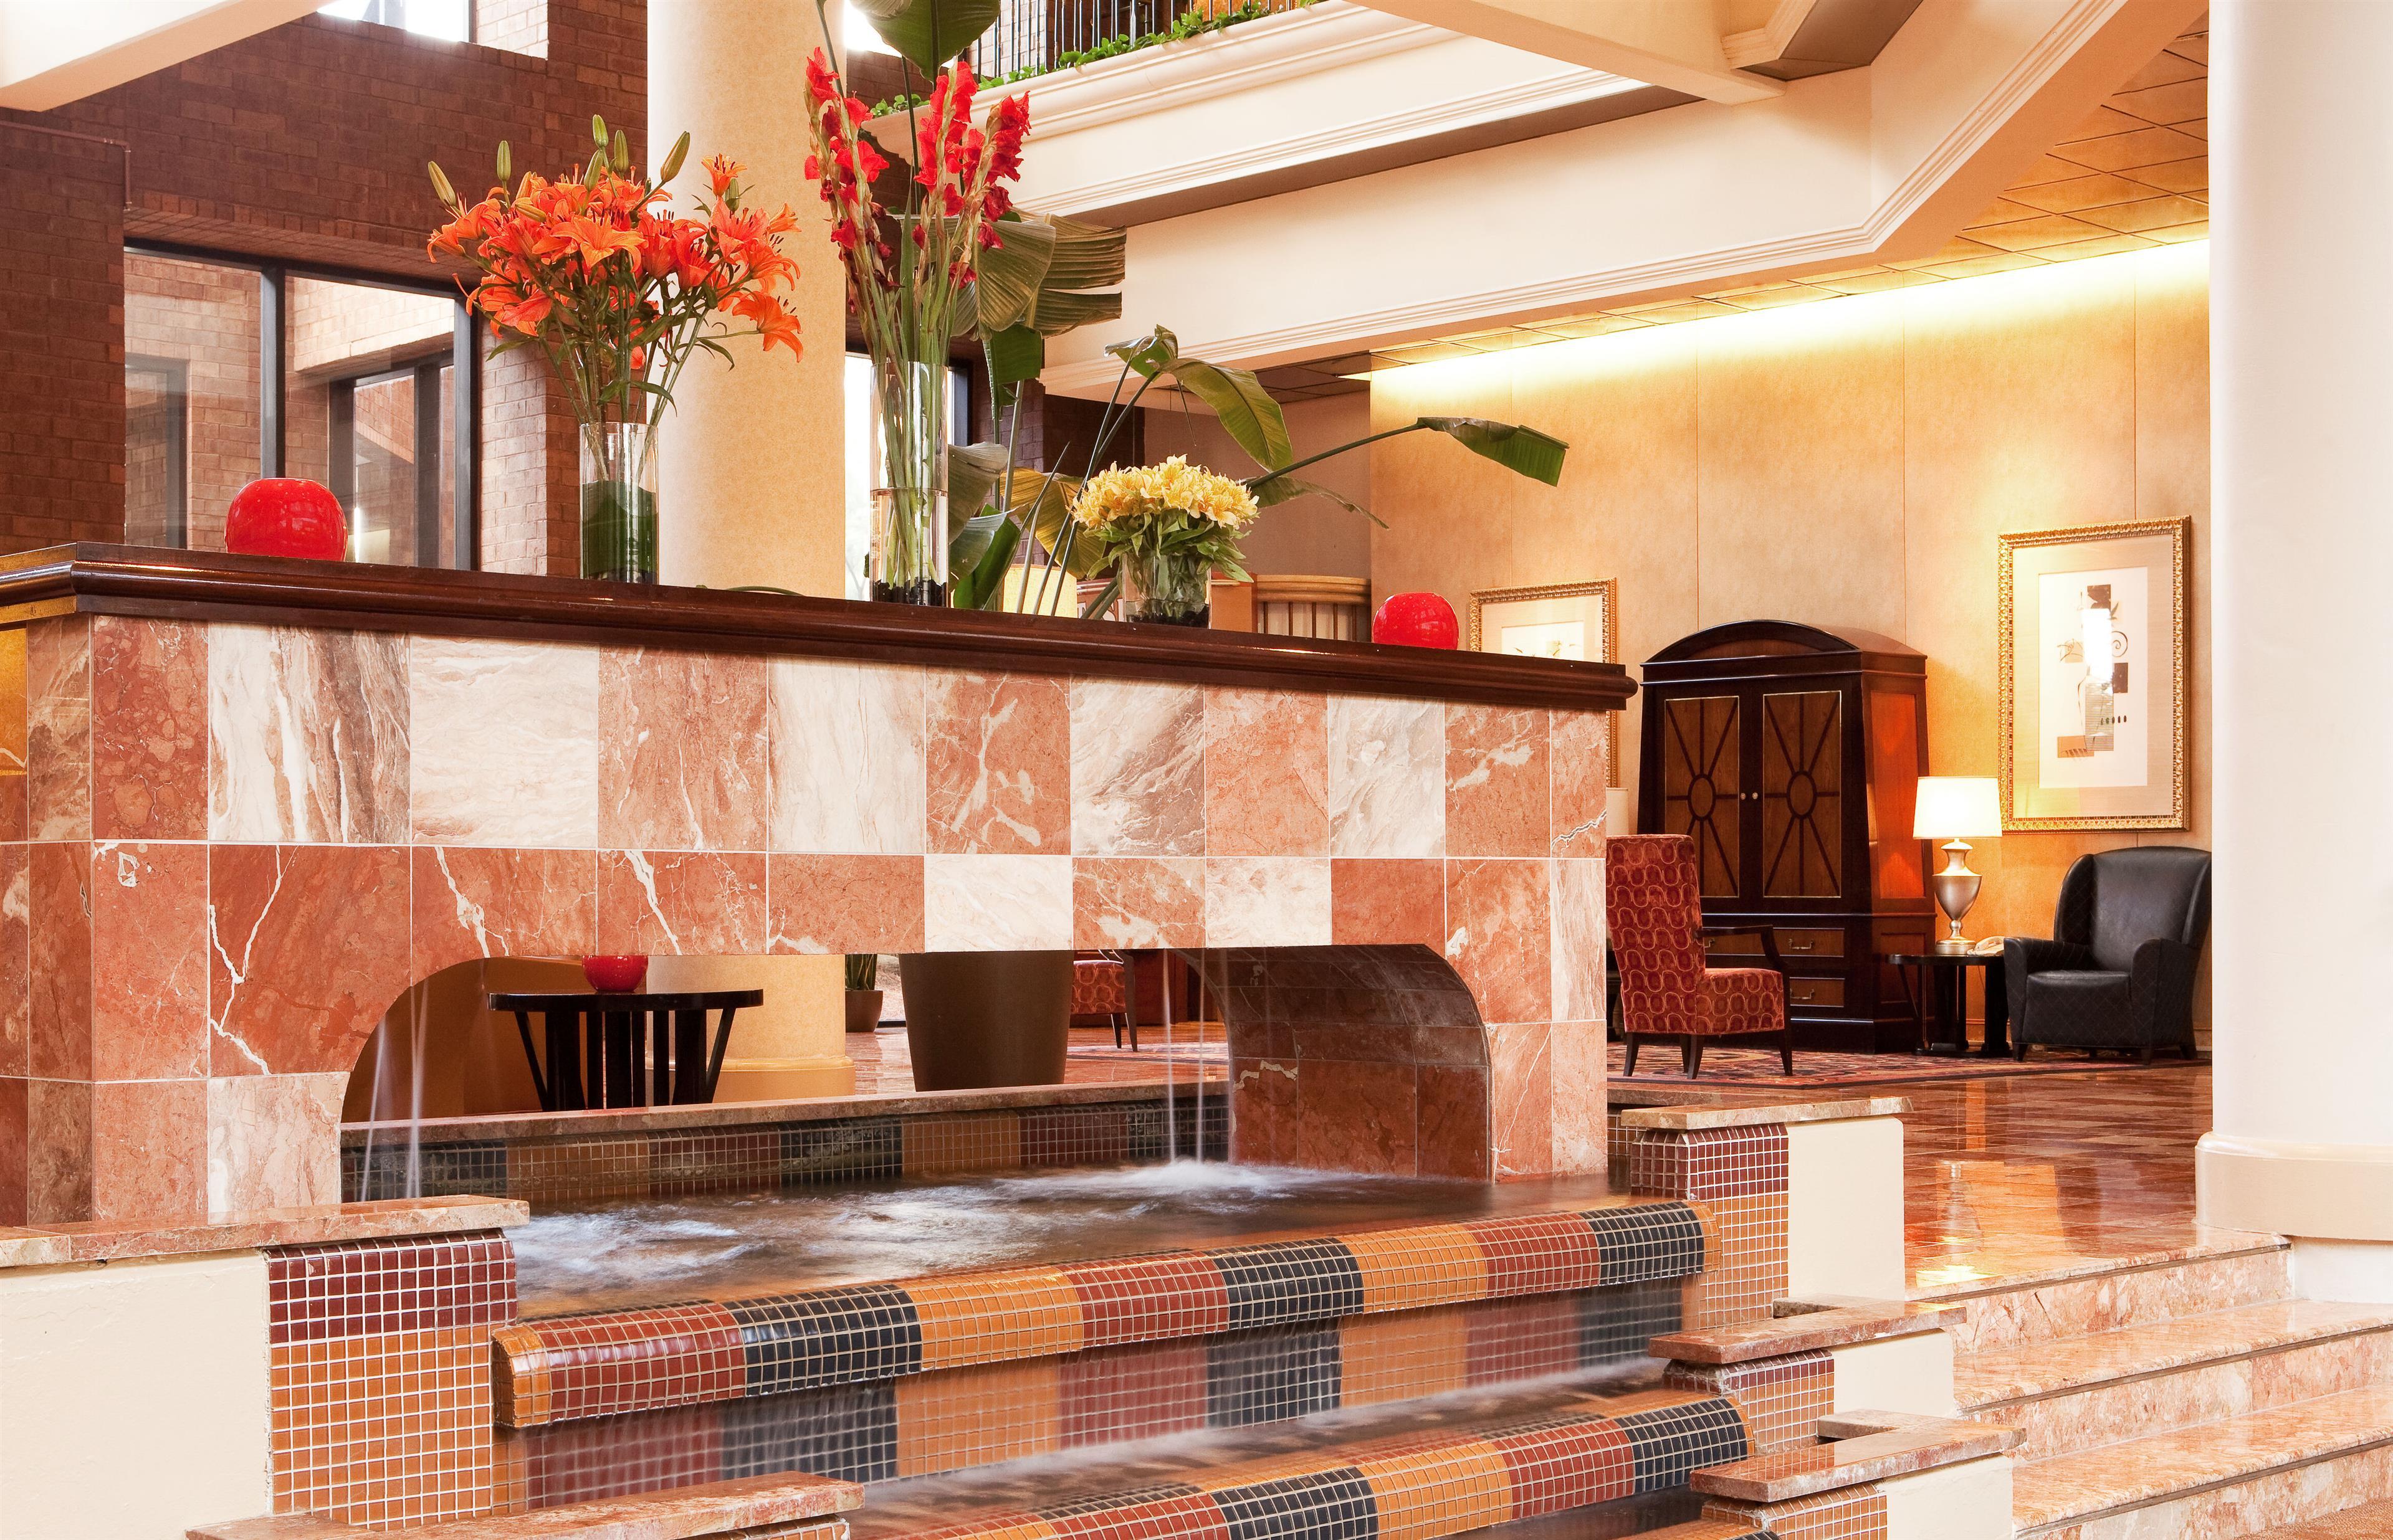 Sheraton Atlanta Airport Hotel image 2